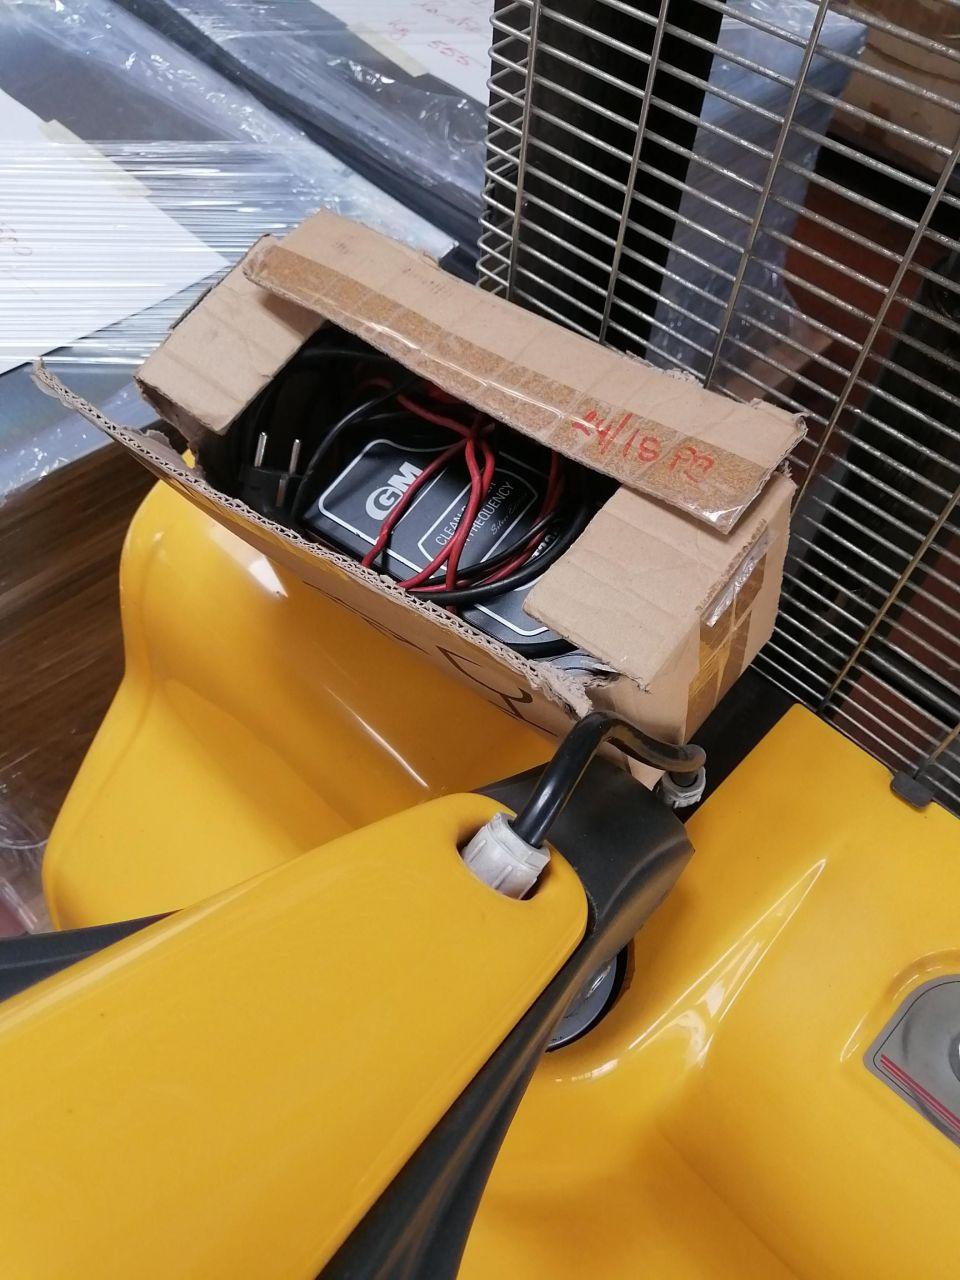 HANDLING-MATERIAL ELECTRIC PALLET TRUCK, 年份: 2006, ref.68308 | www.coci-sa.com/cn | 68308n_4.jpg